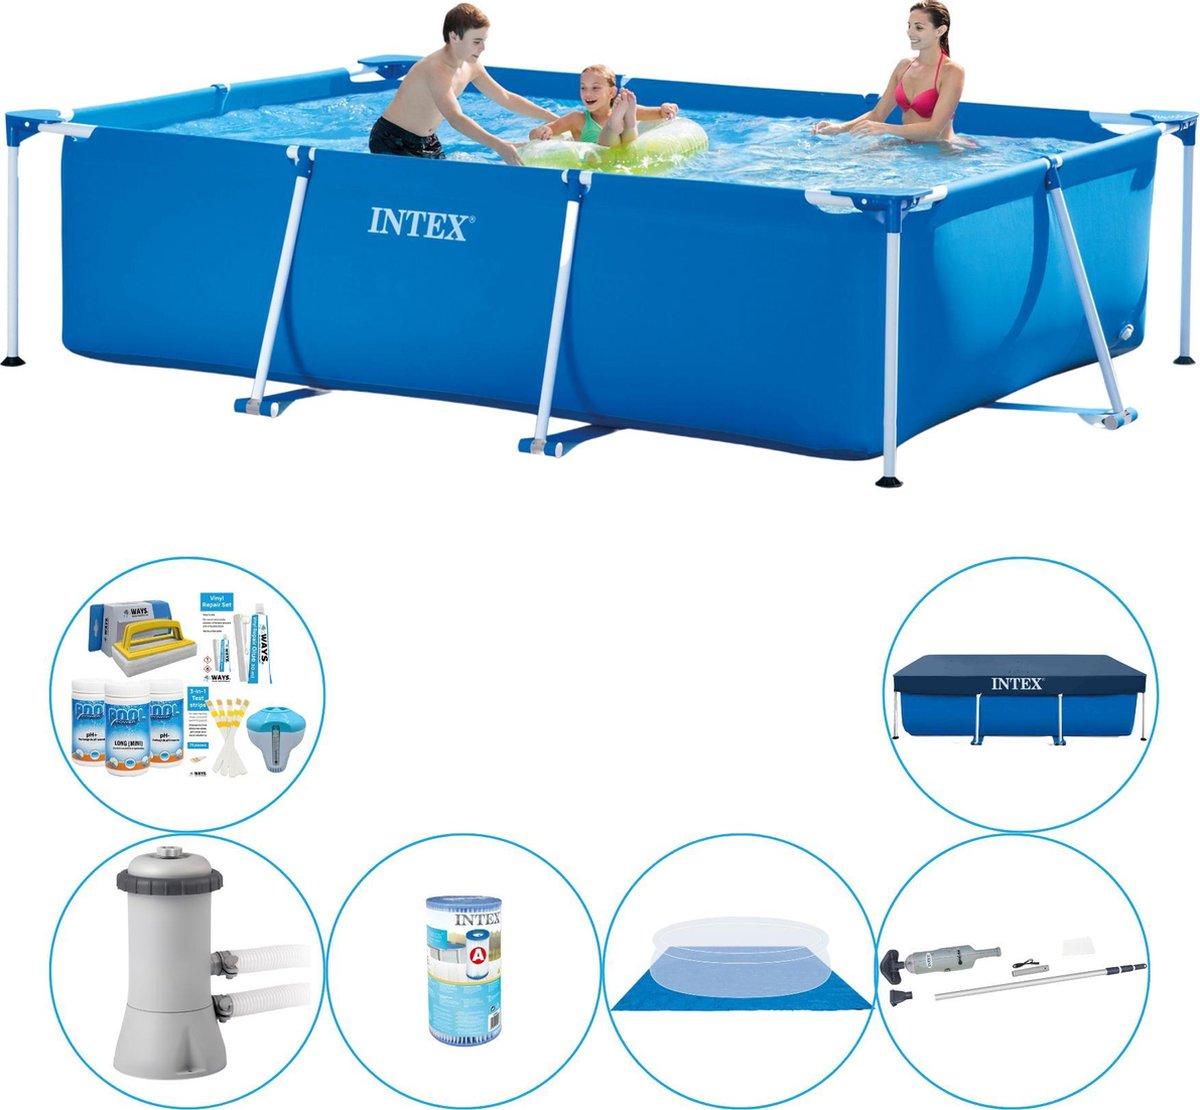 Intex Frame Pool Rechthoekig 300x200x75 cm - Zwembad Inclusief Accessoires